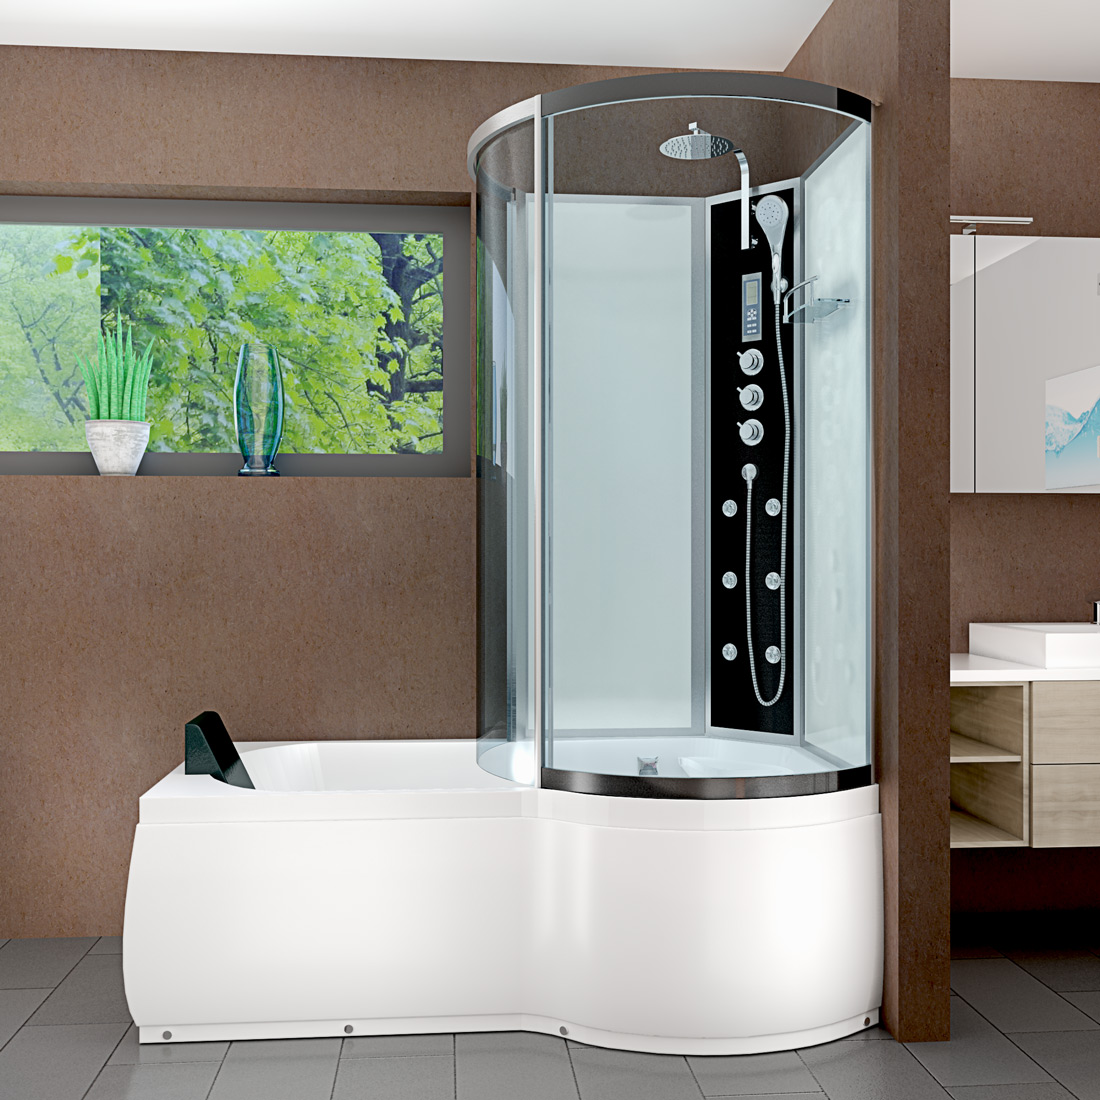 acquavapore dtp8050 a005l dusch wannen kombi in 170x98cm trendbad24. Black Bedroom Furniture Sets. Home Design Ideas